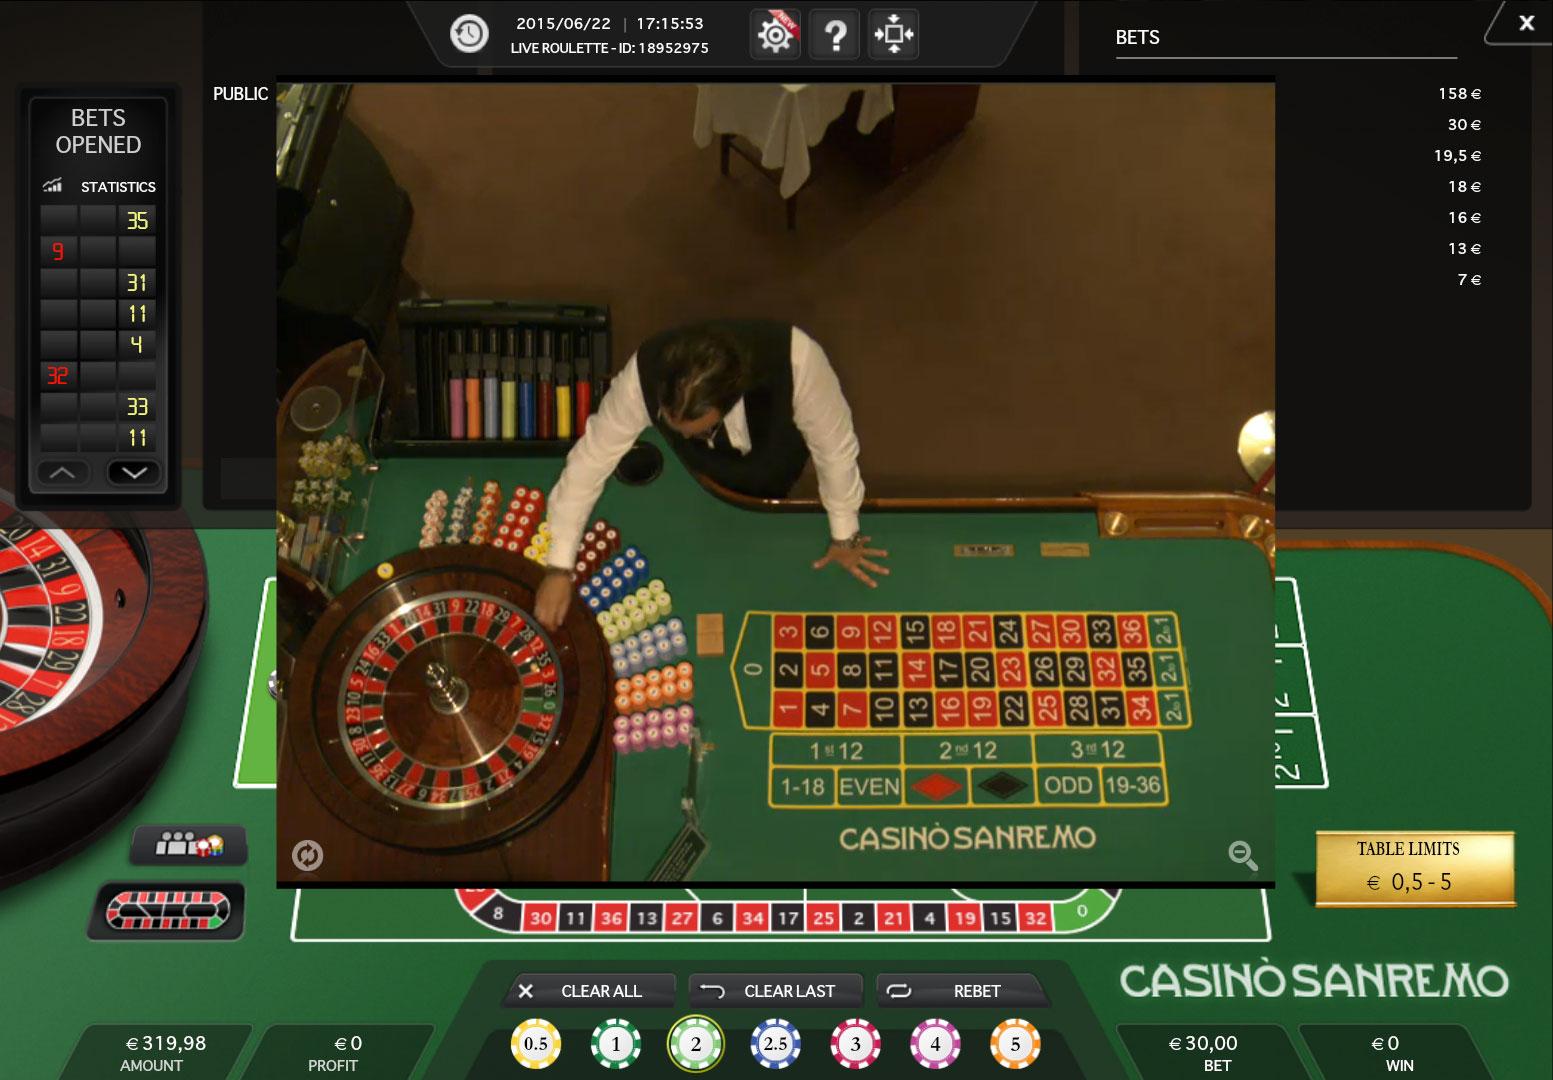 Casino sanremo online